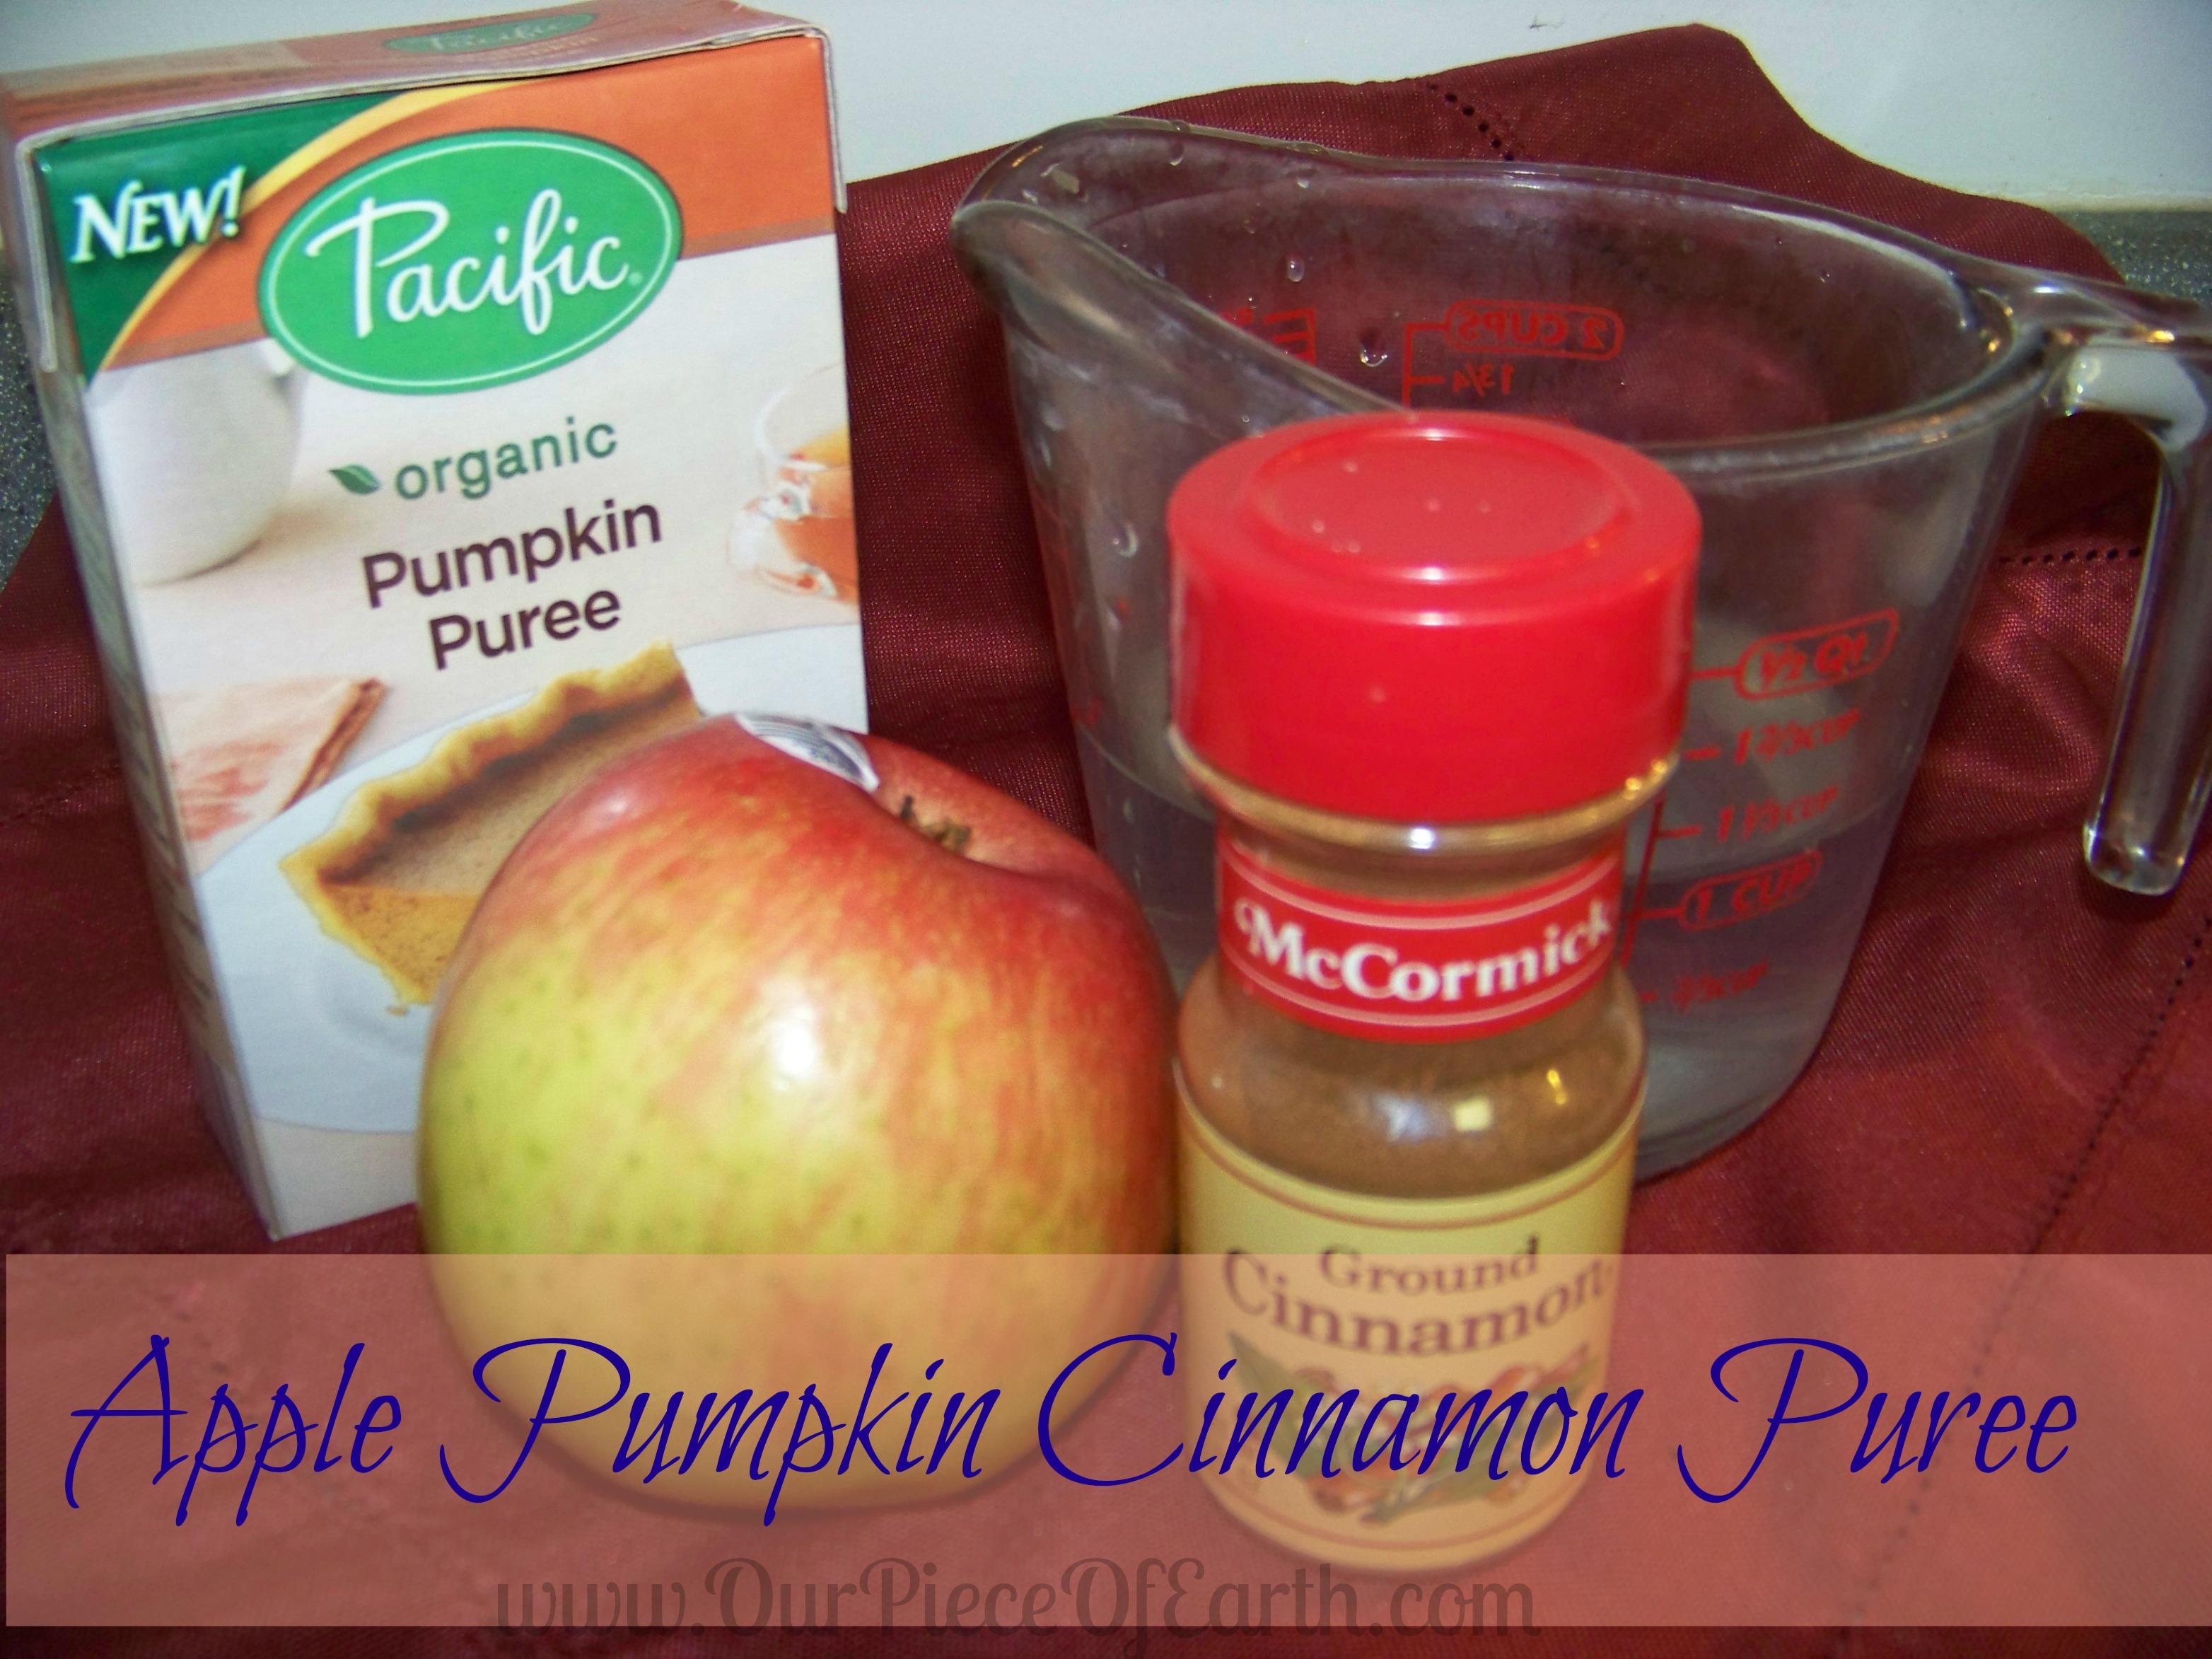 Apple Pumpkin Cinnamon Puree, Yummi Pouch